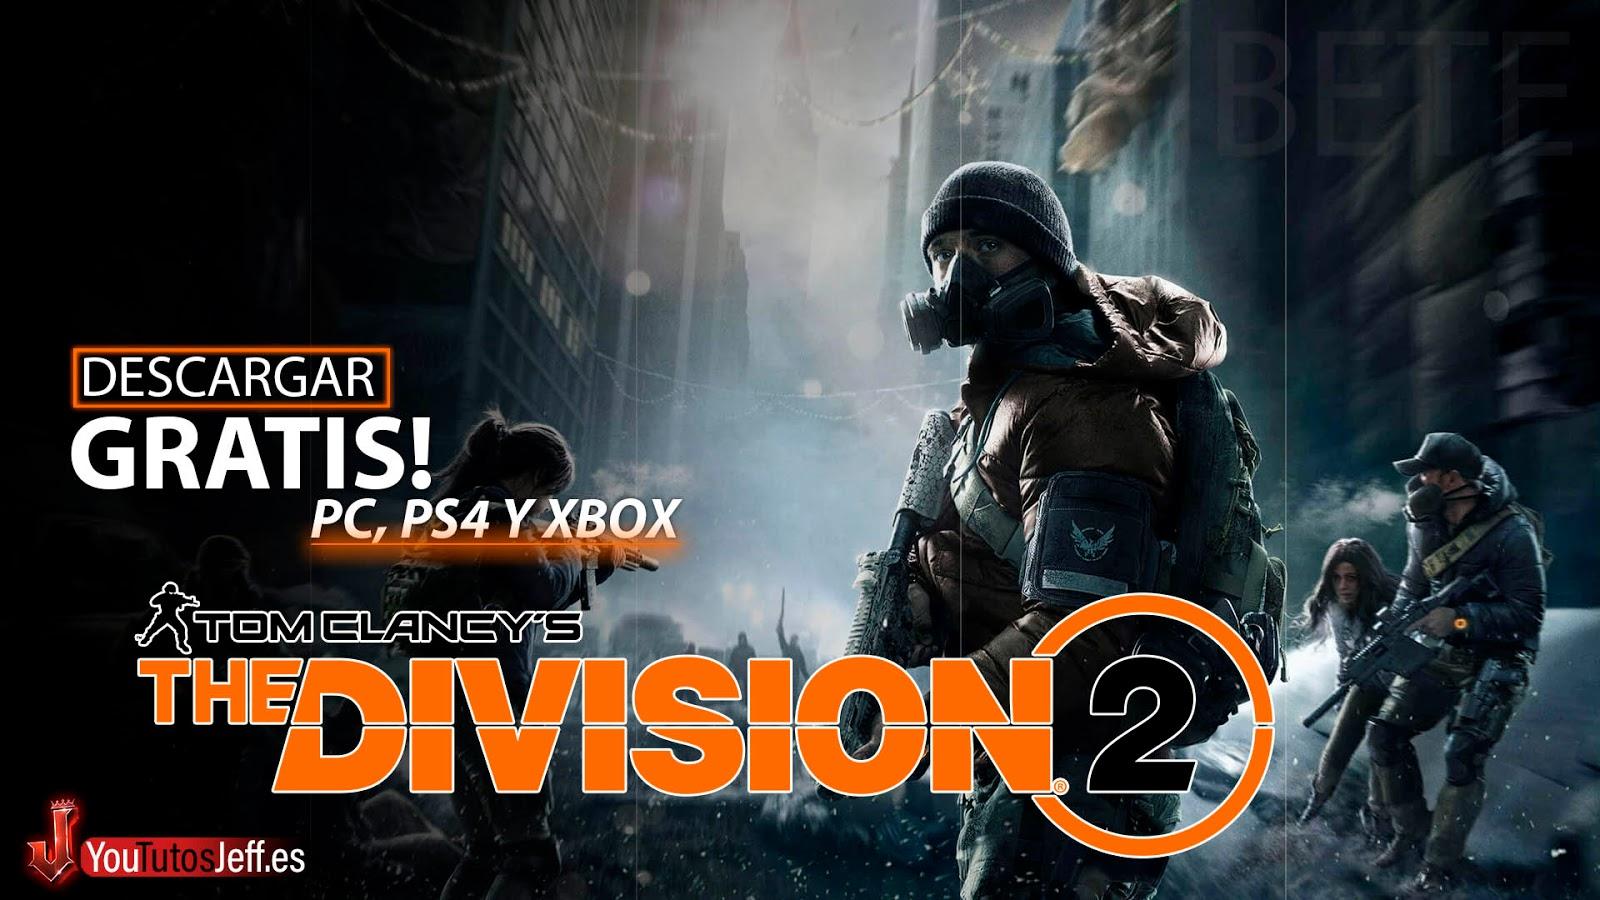 The Divison 2 GRATIS!😍🔥APROVECHA AHORA